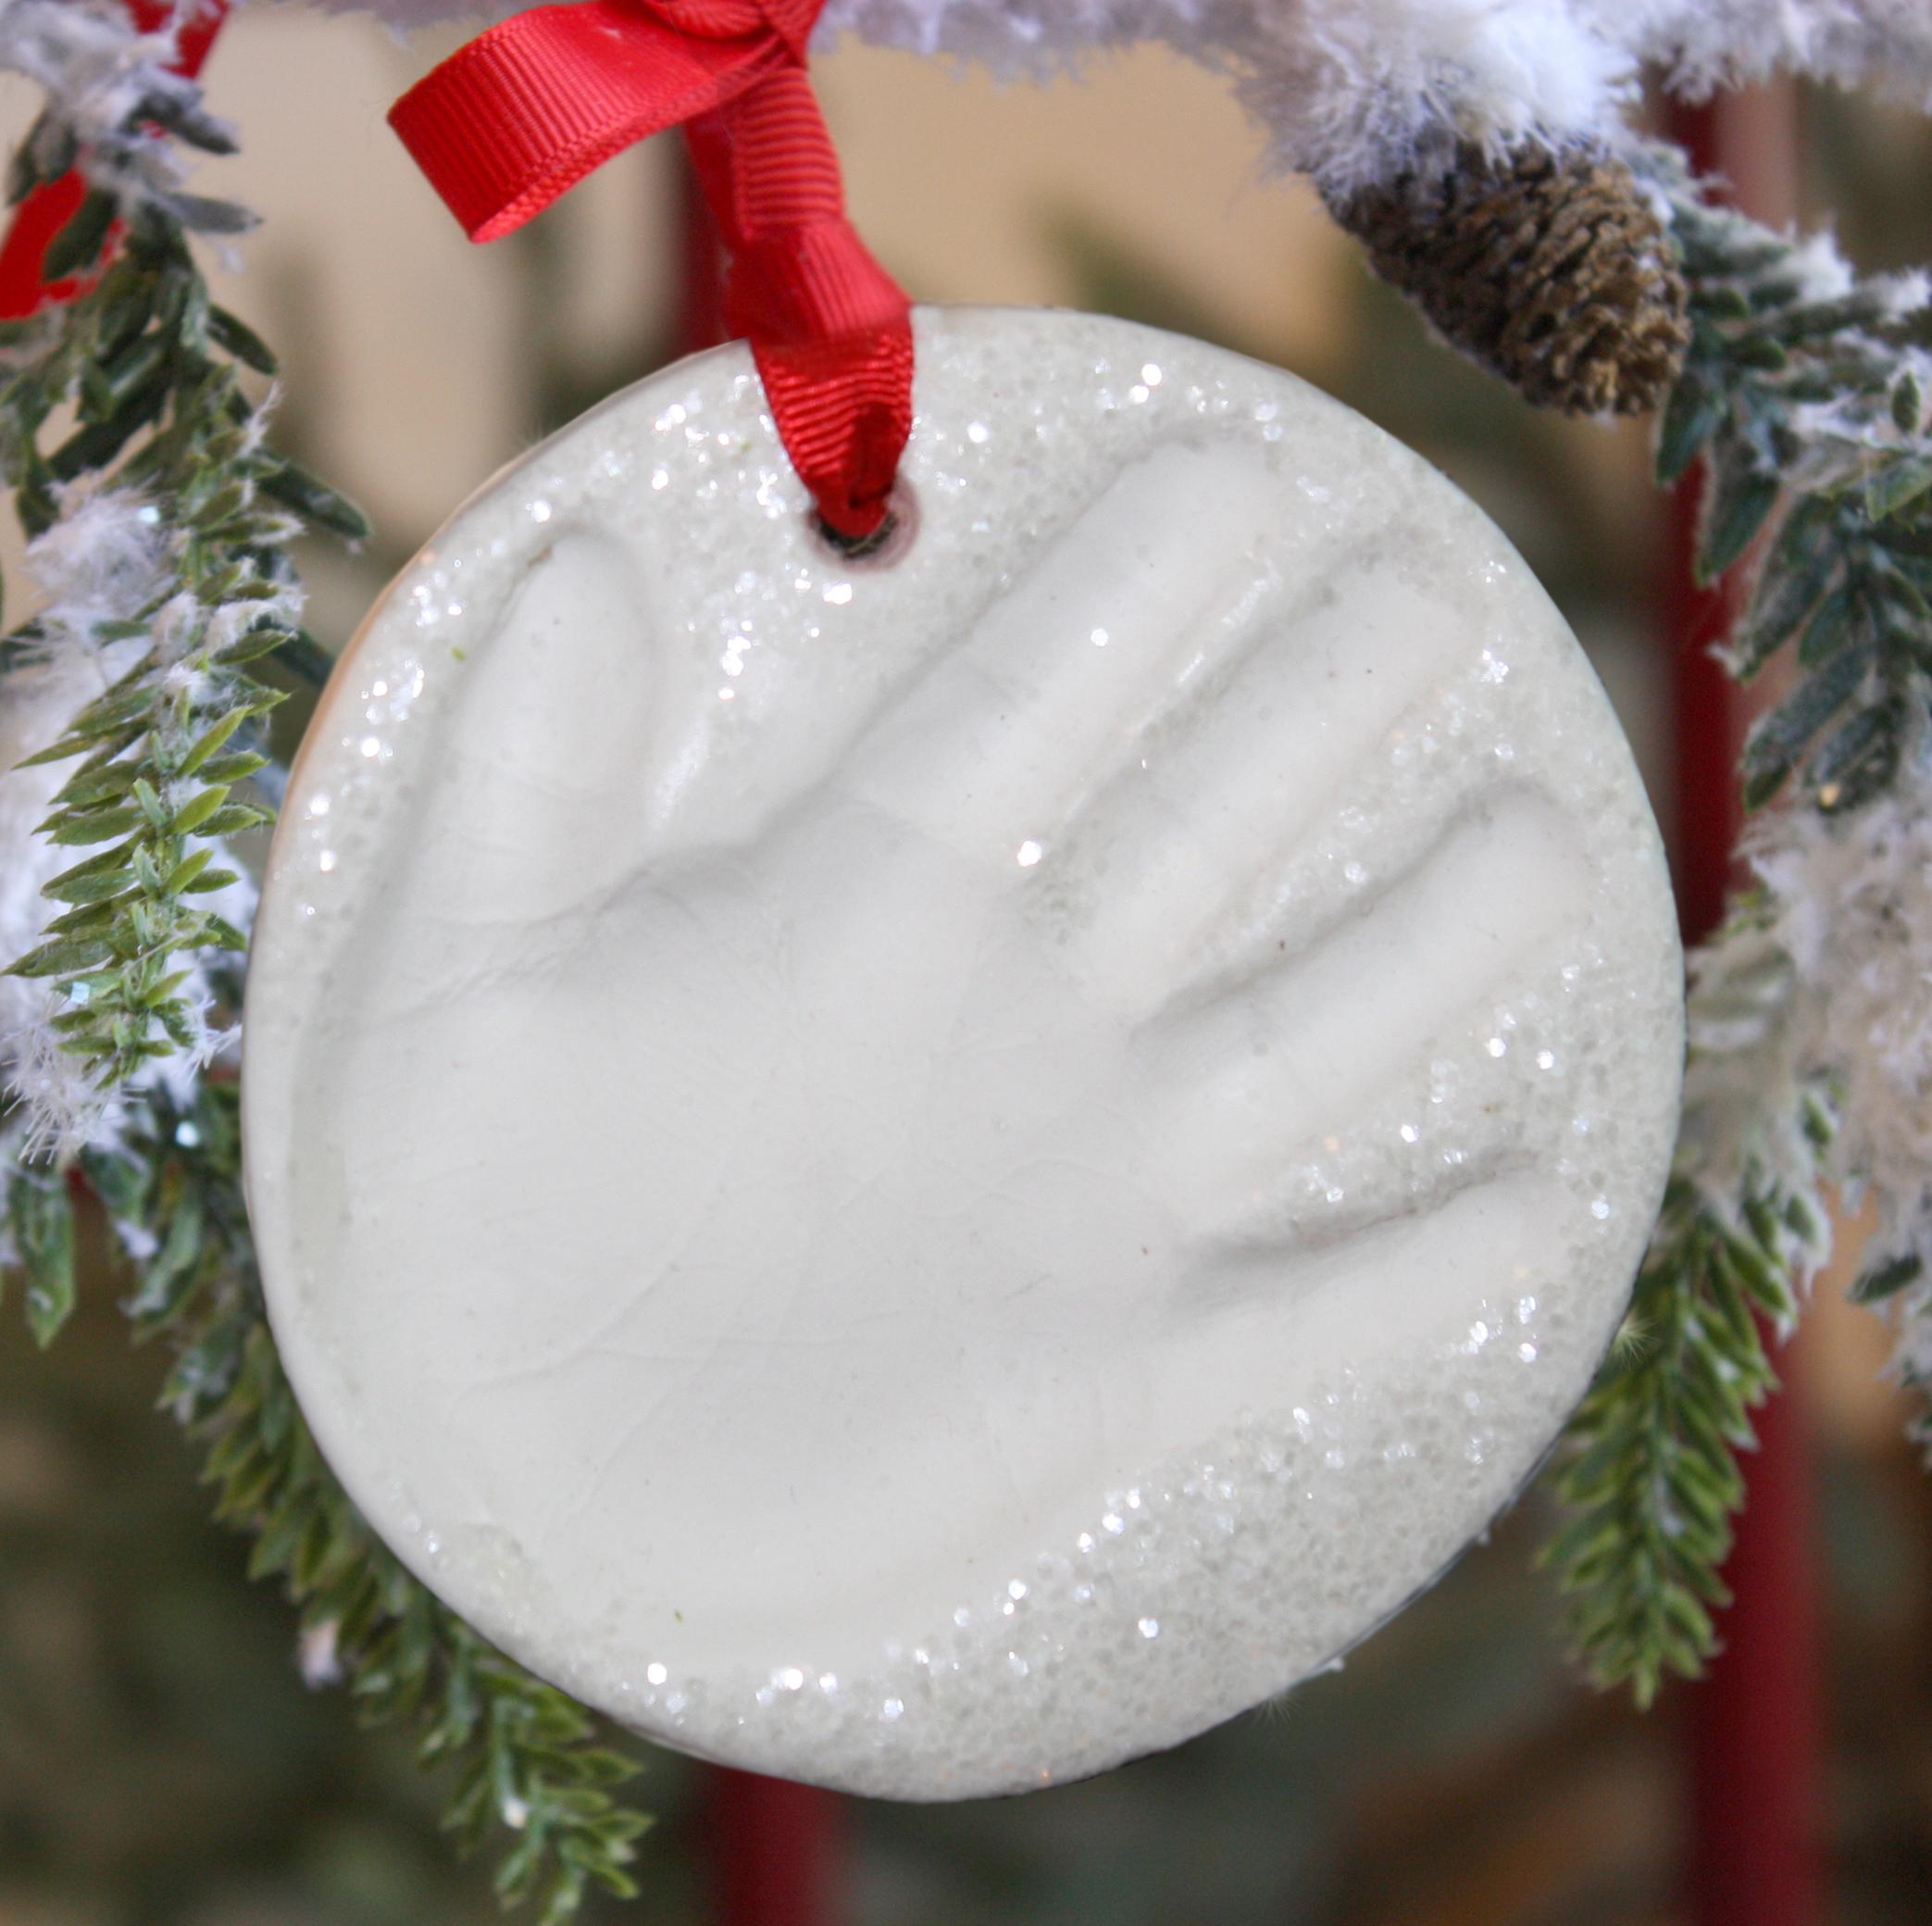 Child to Cherish Snowprints Handprint Ornament Kit